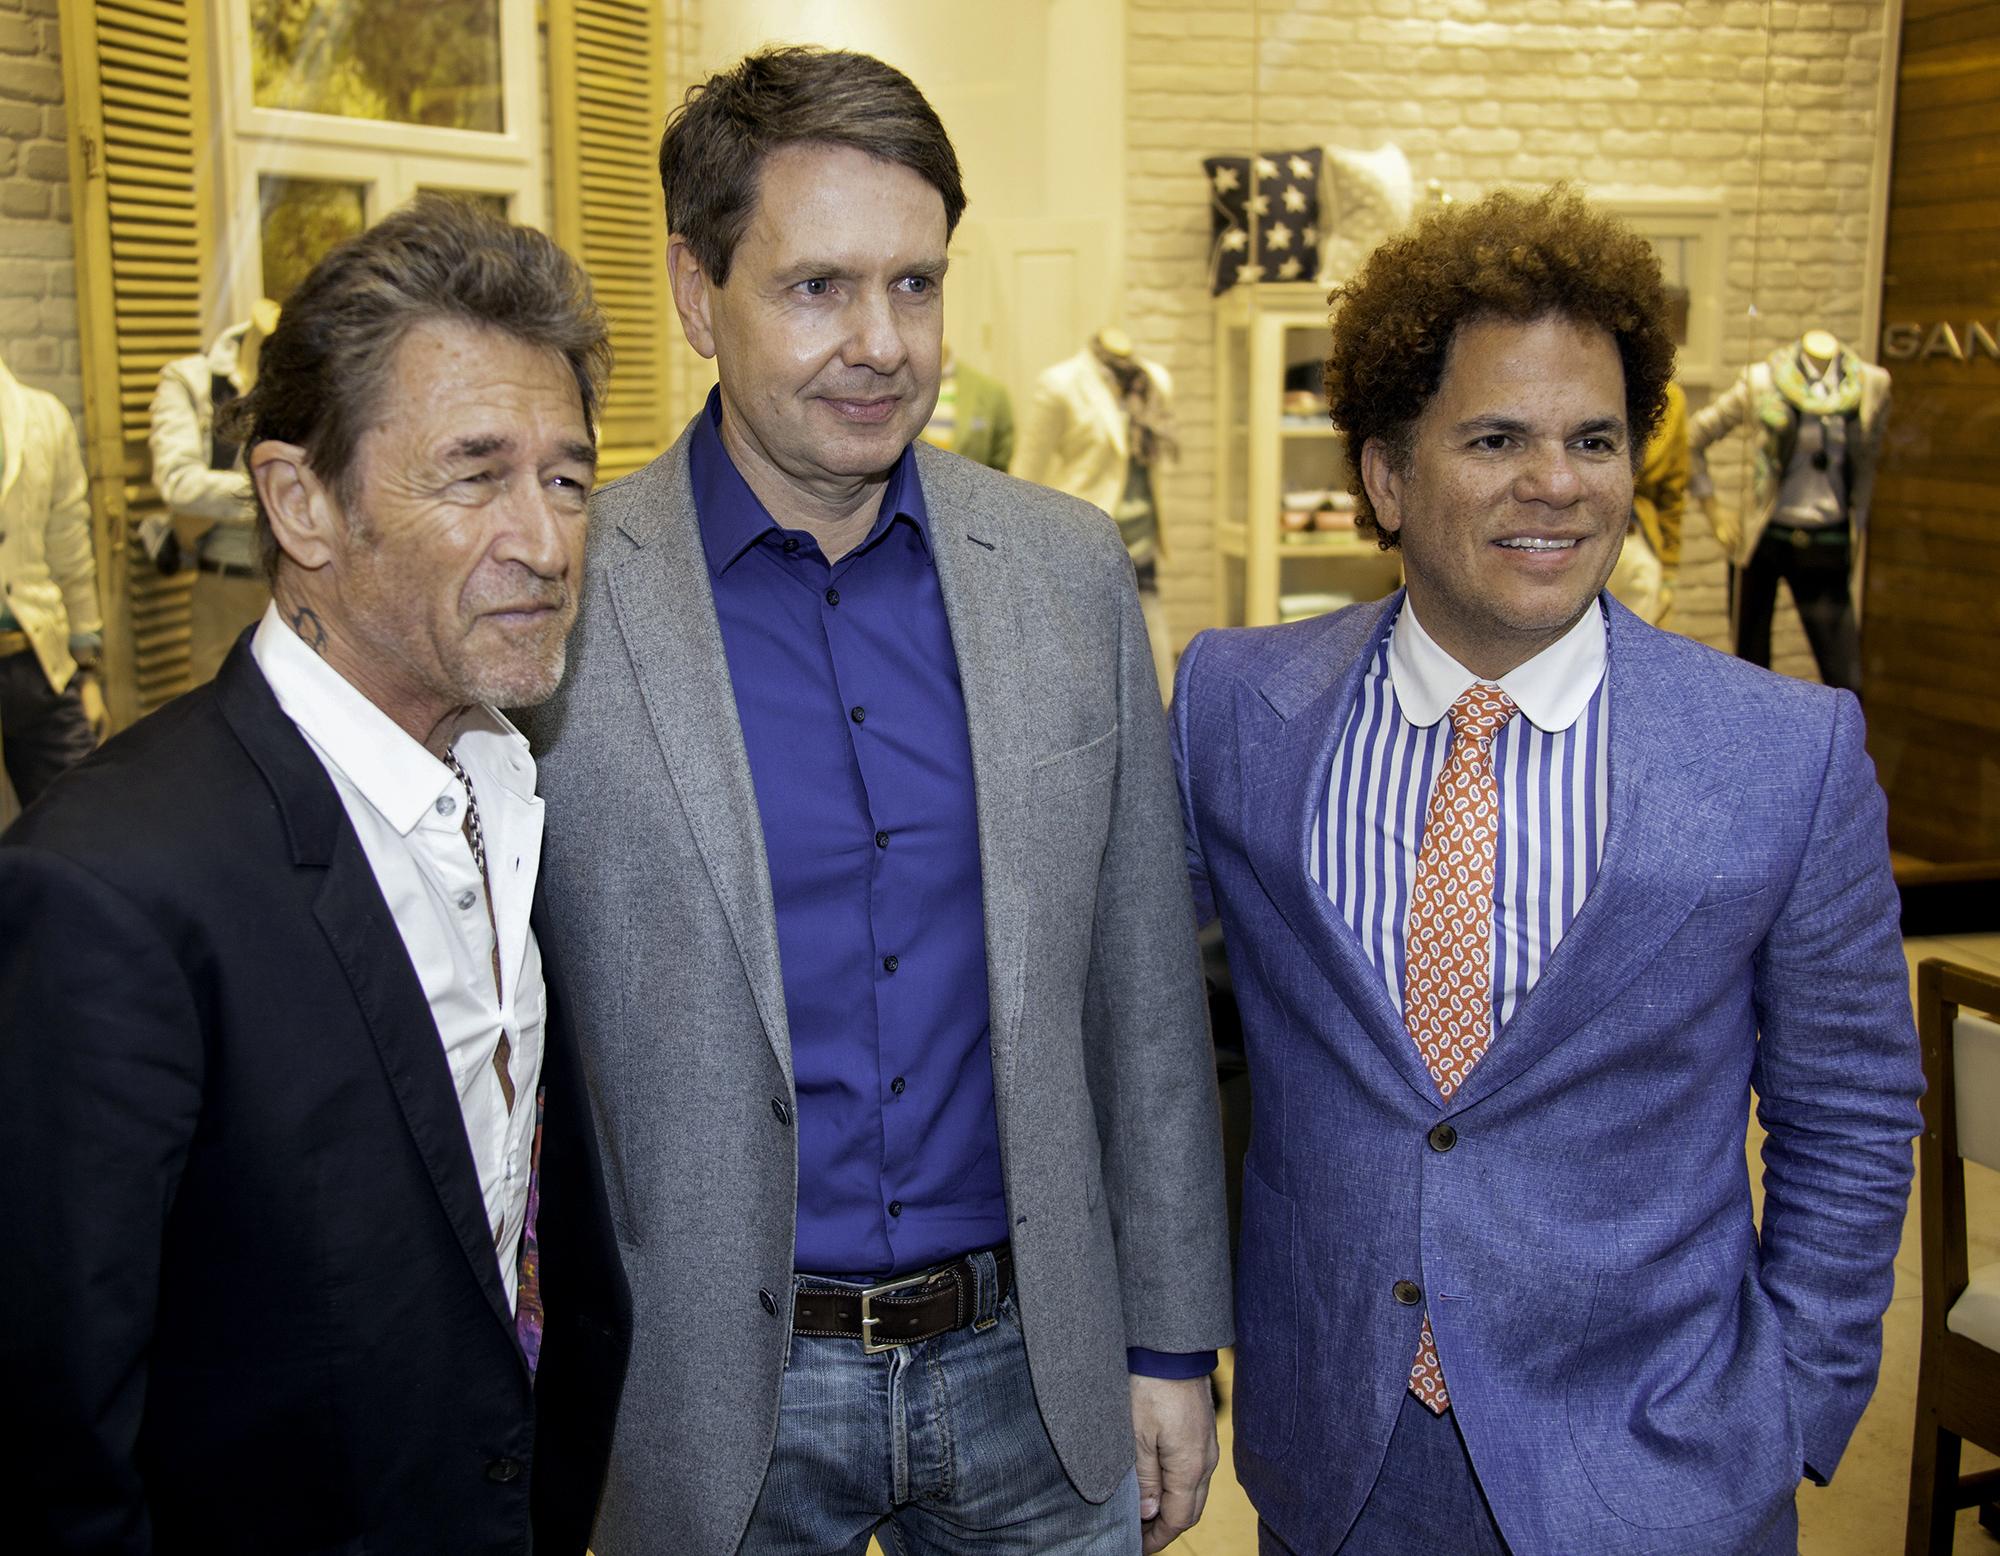 Romero Britto mit Harry Mensing und Peter Maffay